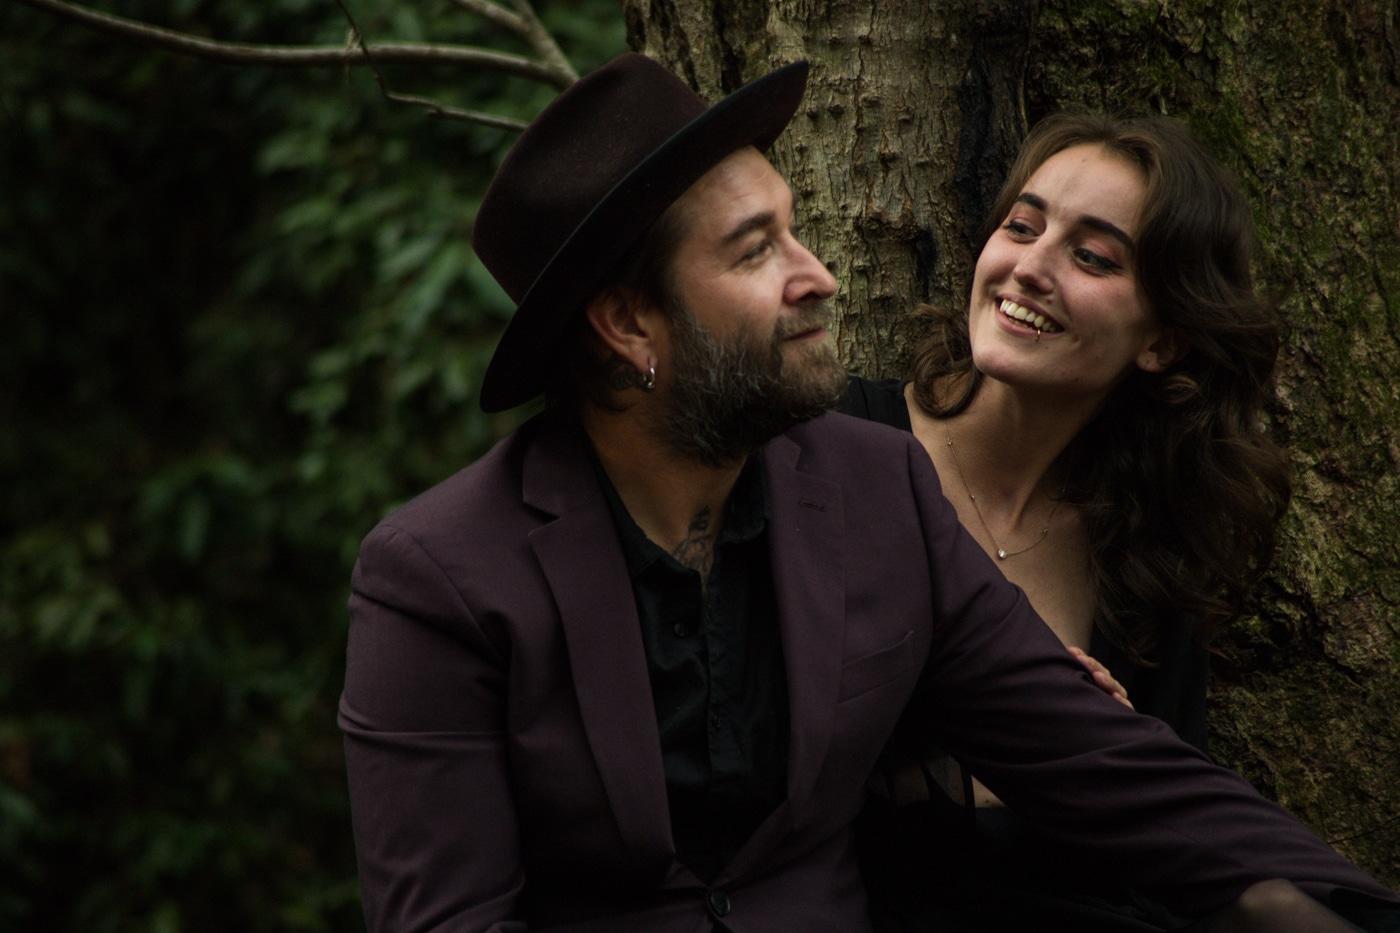 couples portraits in backyard with Atlanta GA photographer